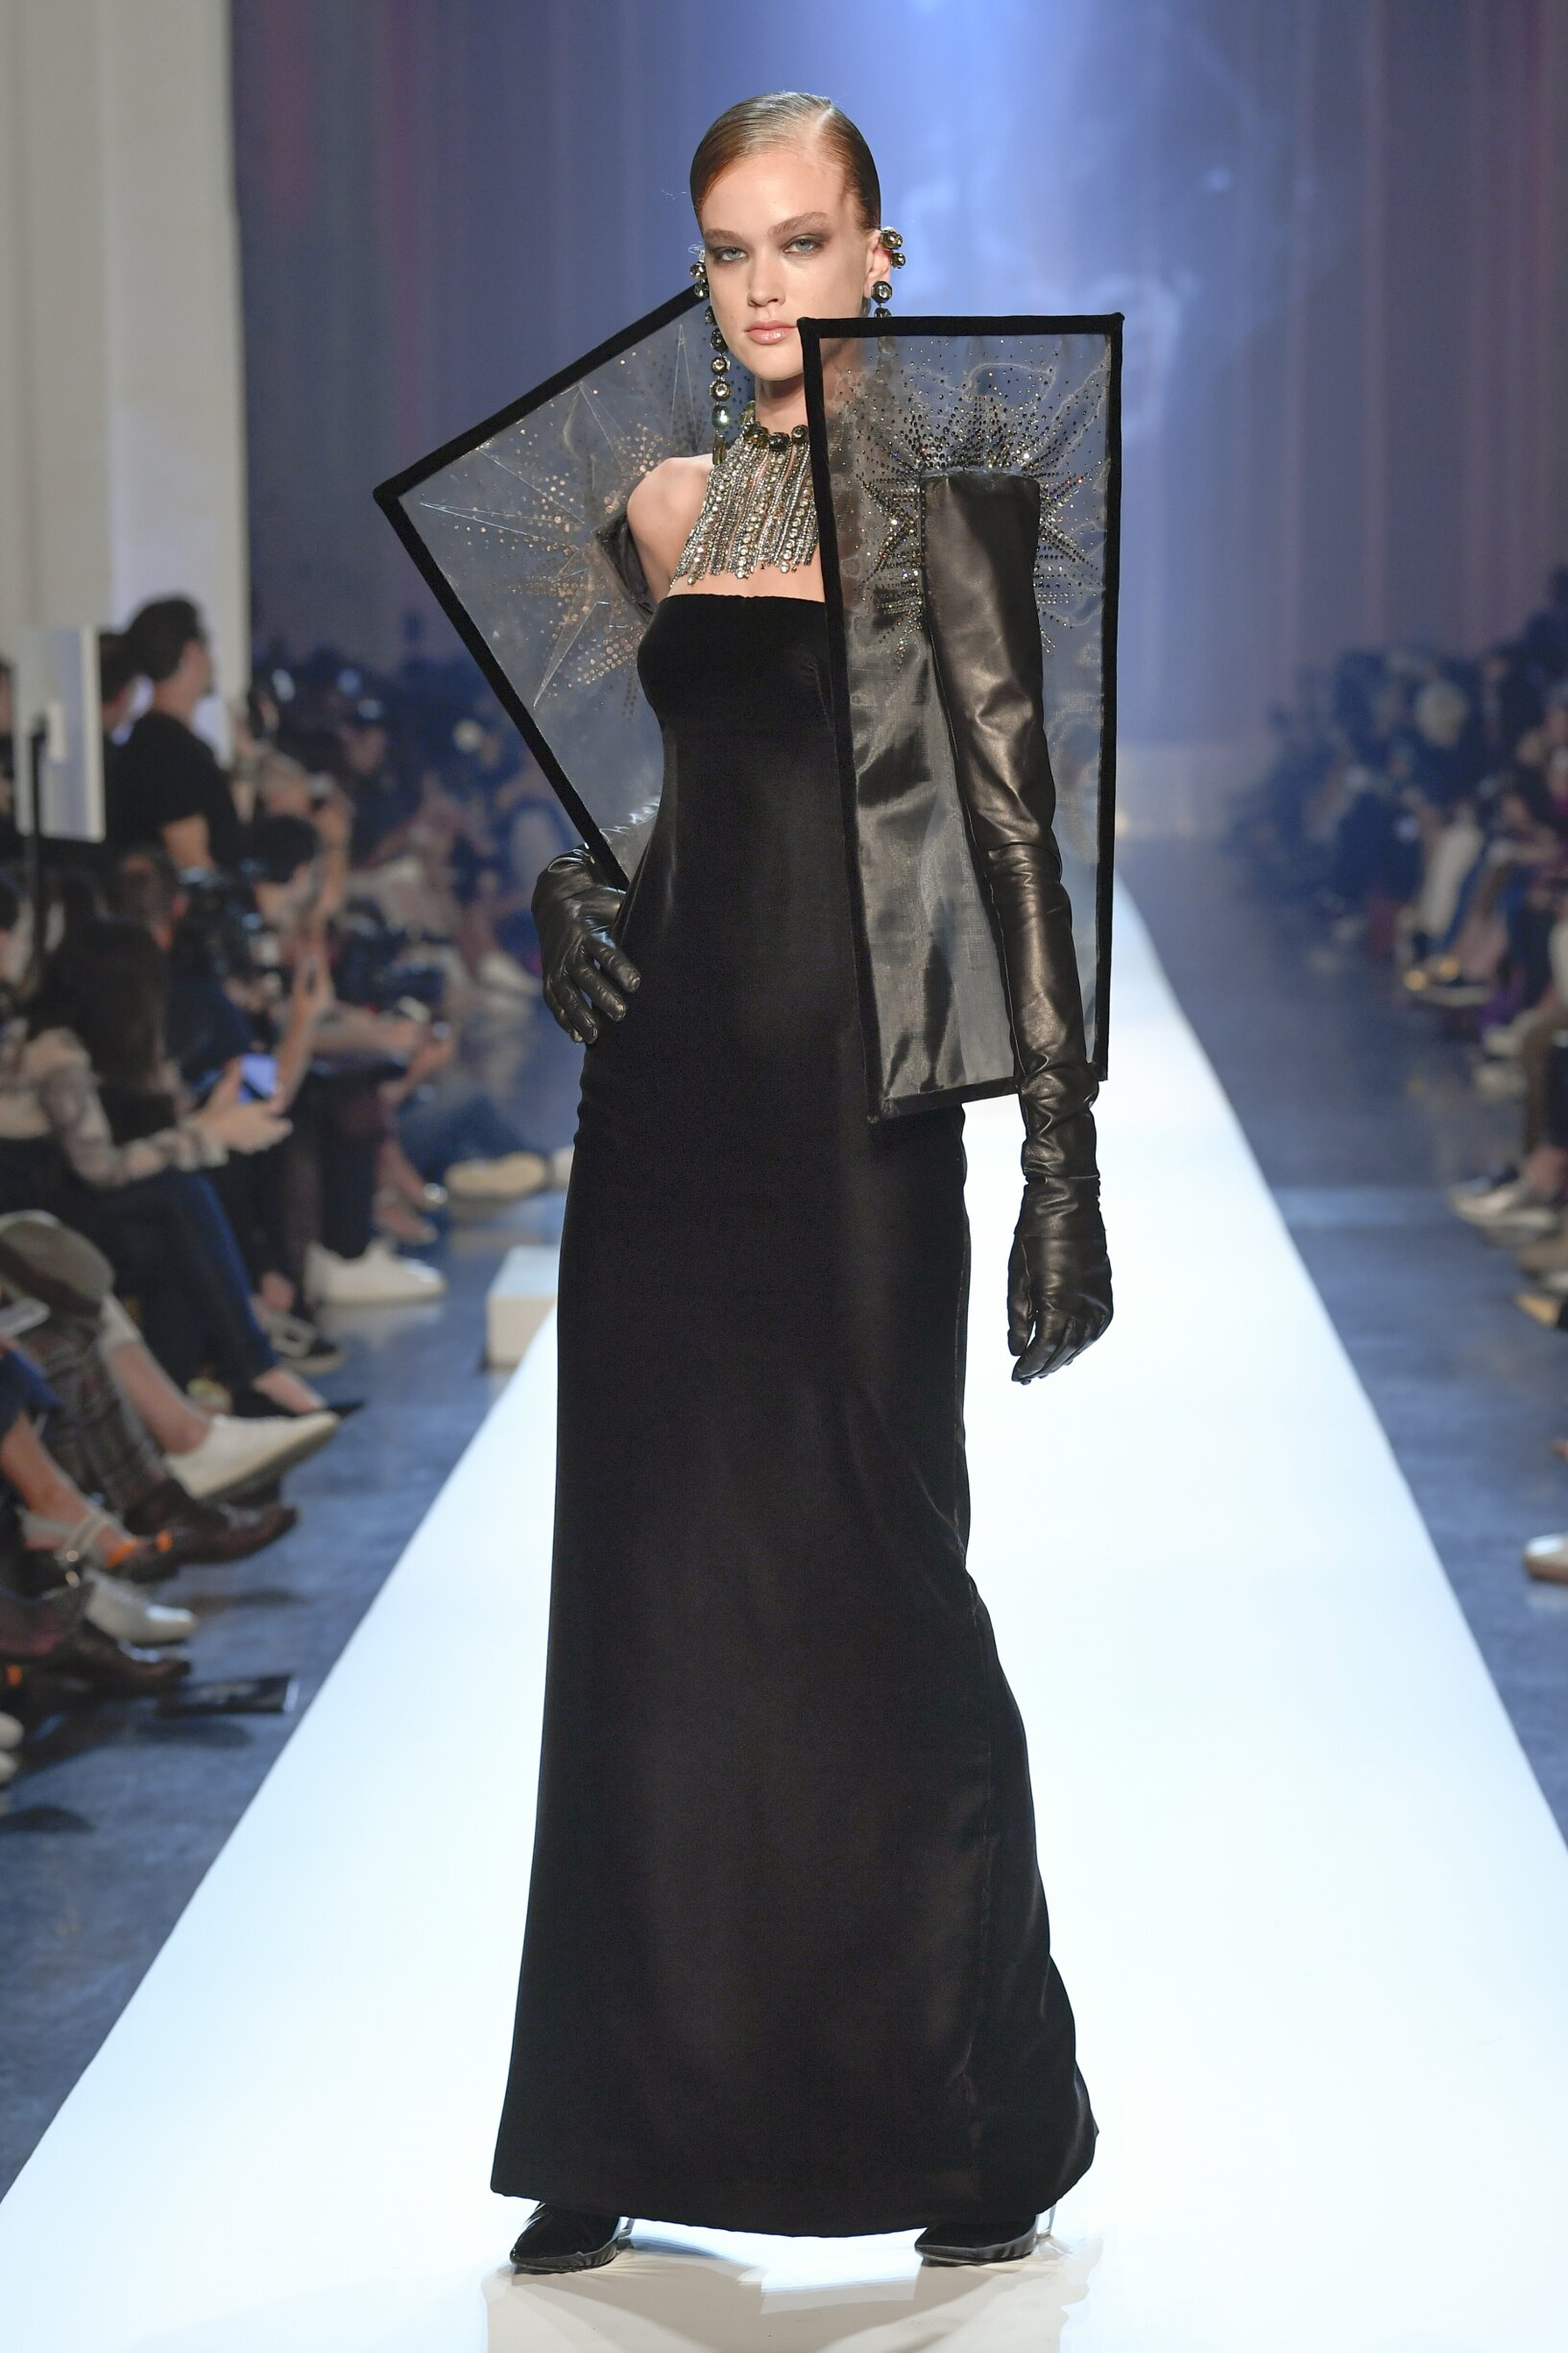 2018 Jean-Paul Gaultier Haute Couture Winter Catwalk